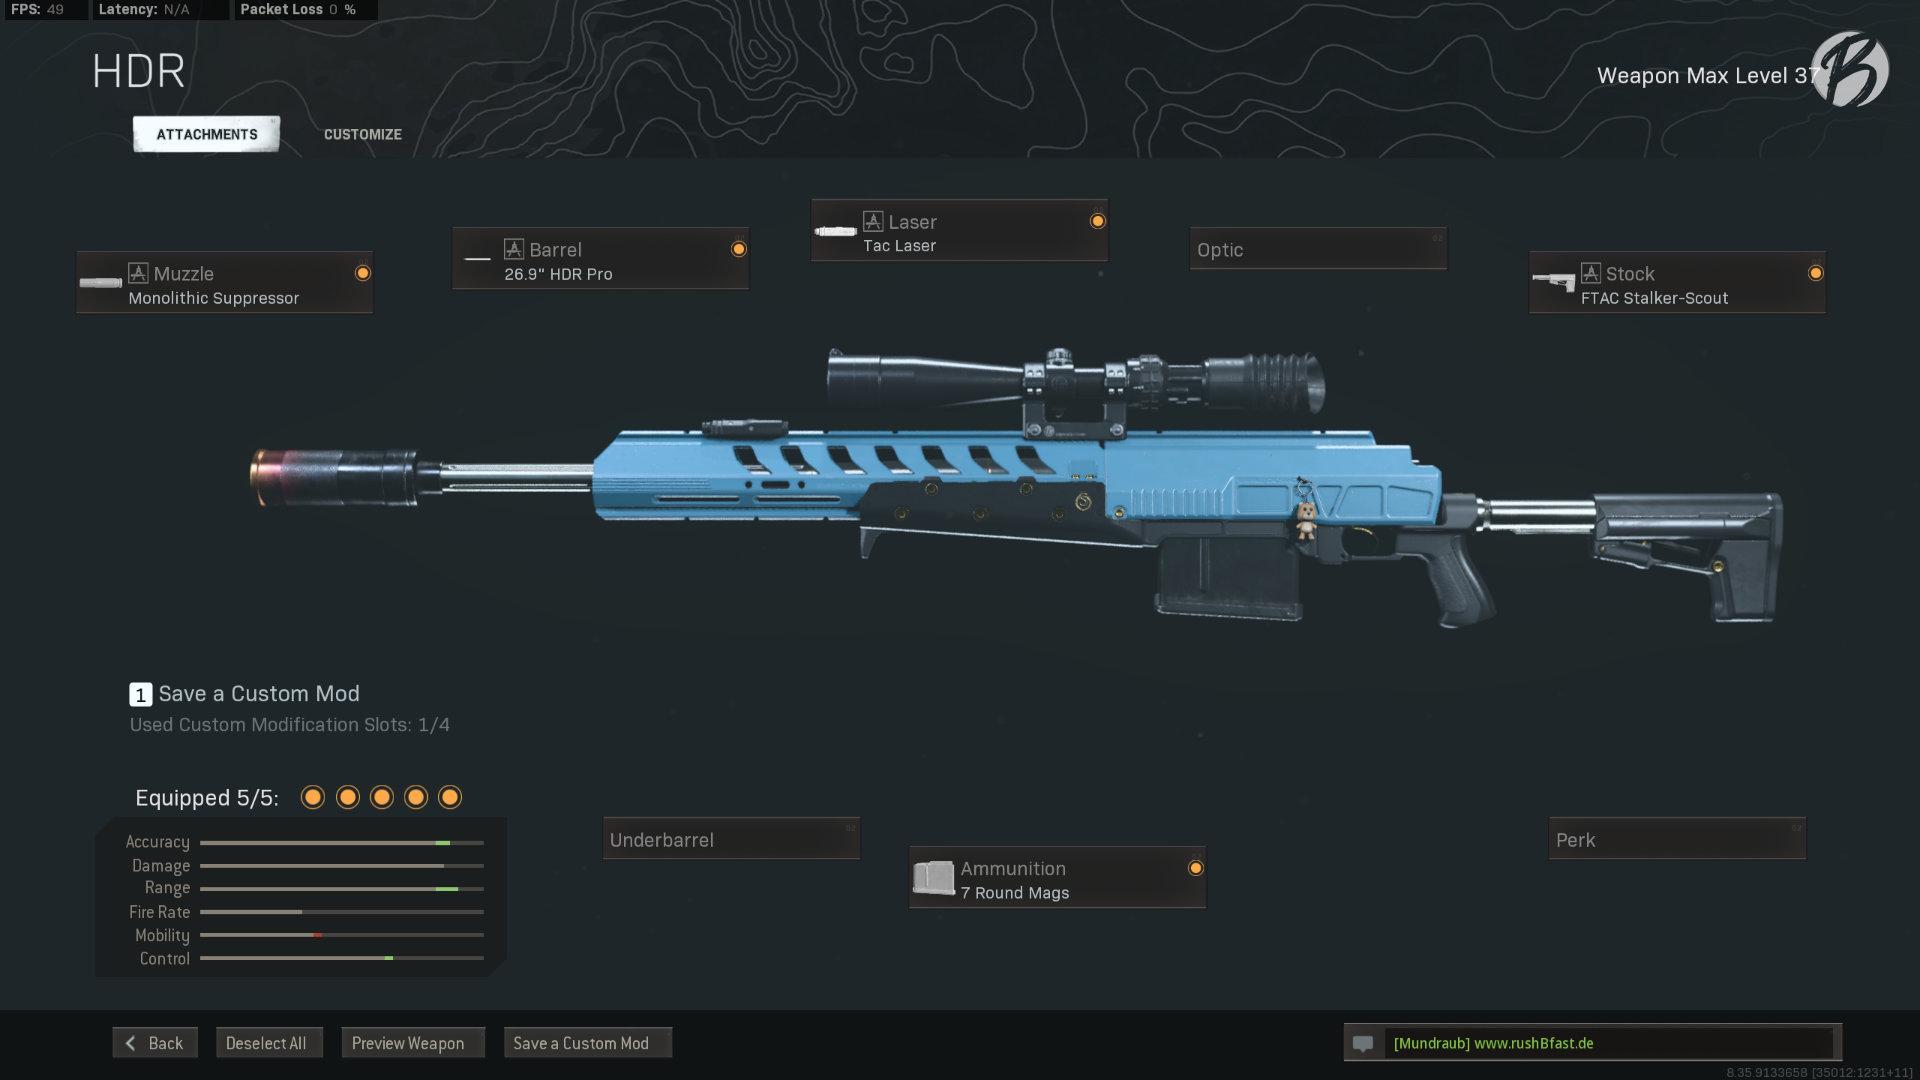 Call of Duty Warzone - Cold War Season 3 - HDR